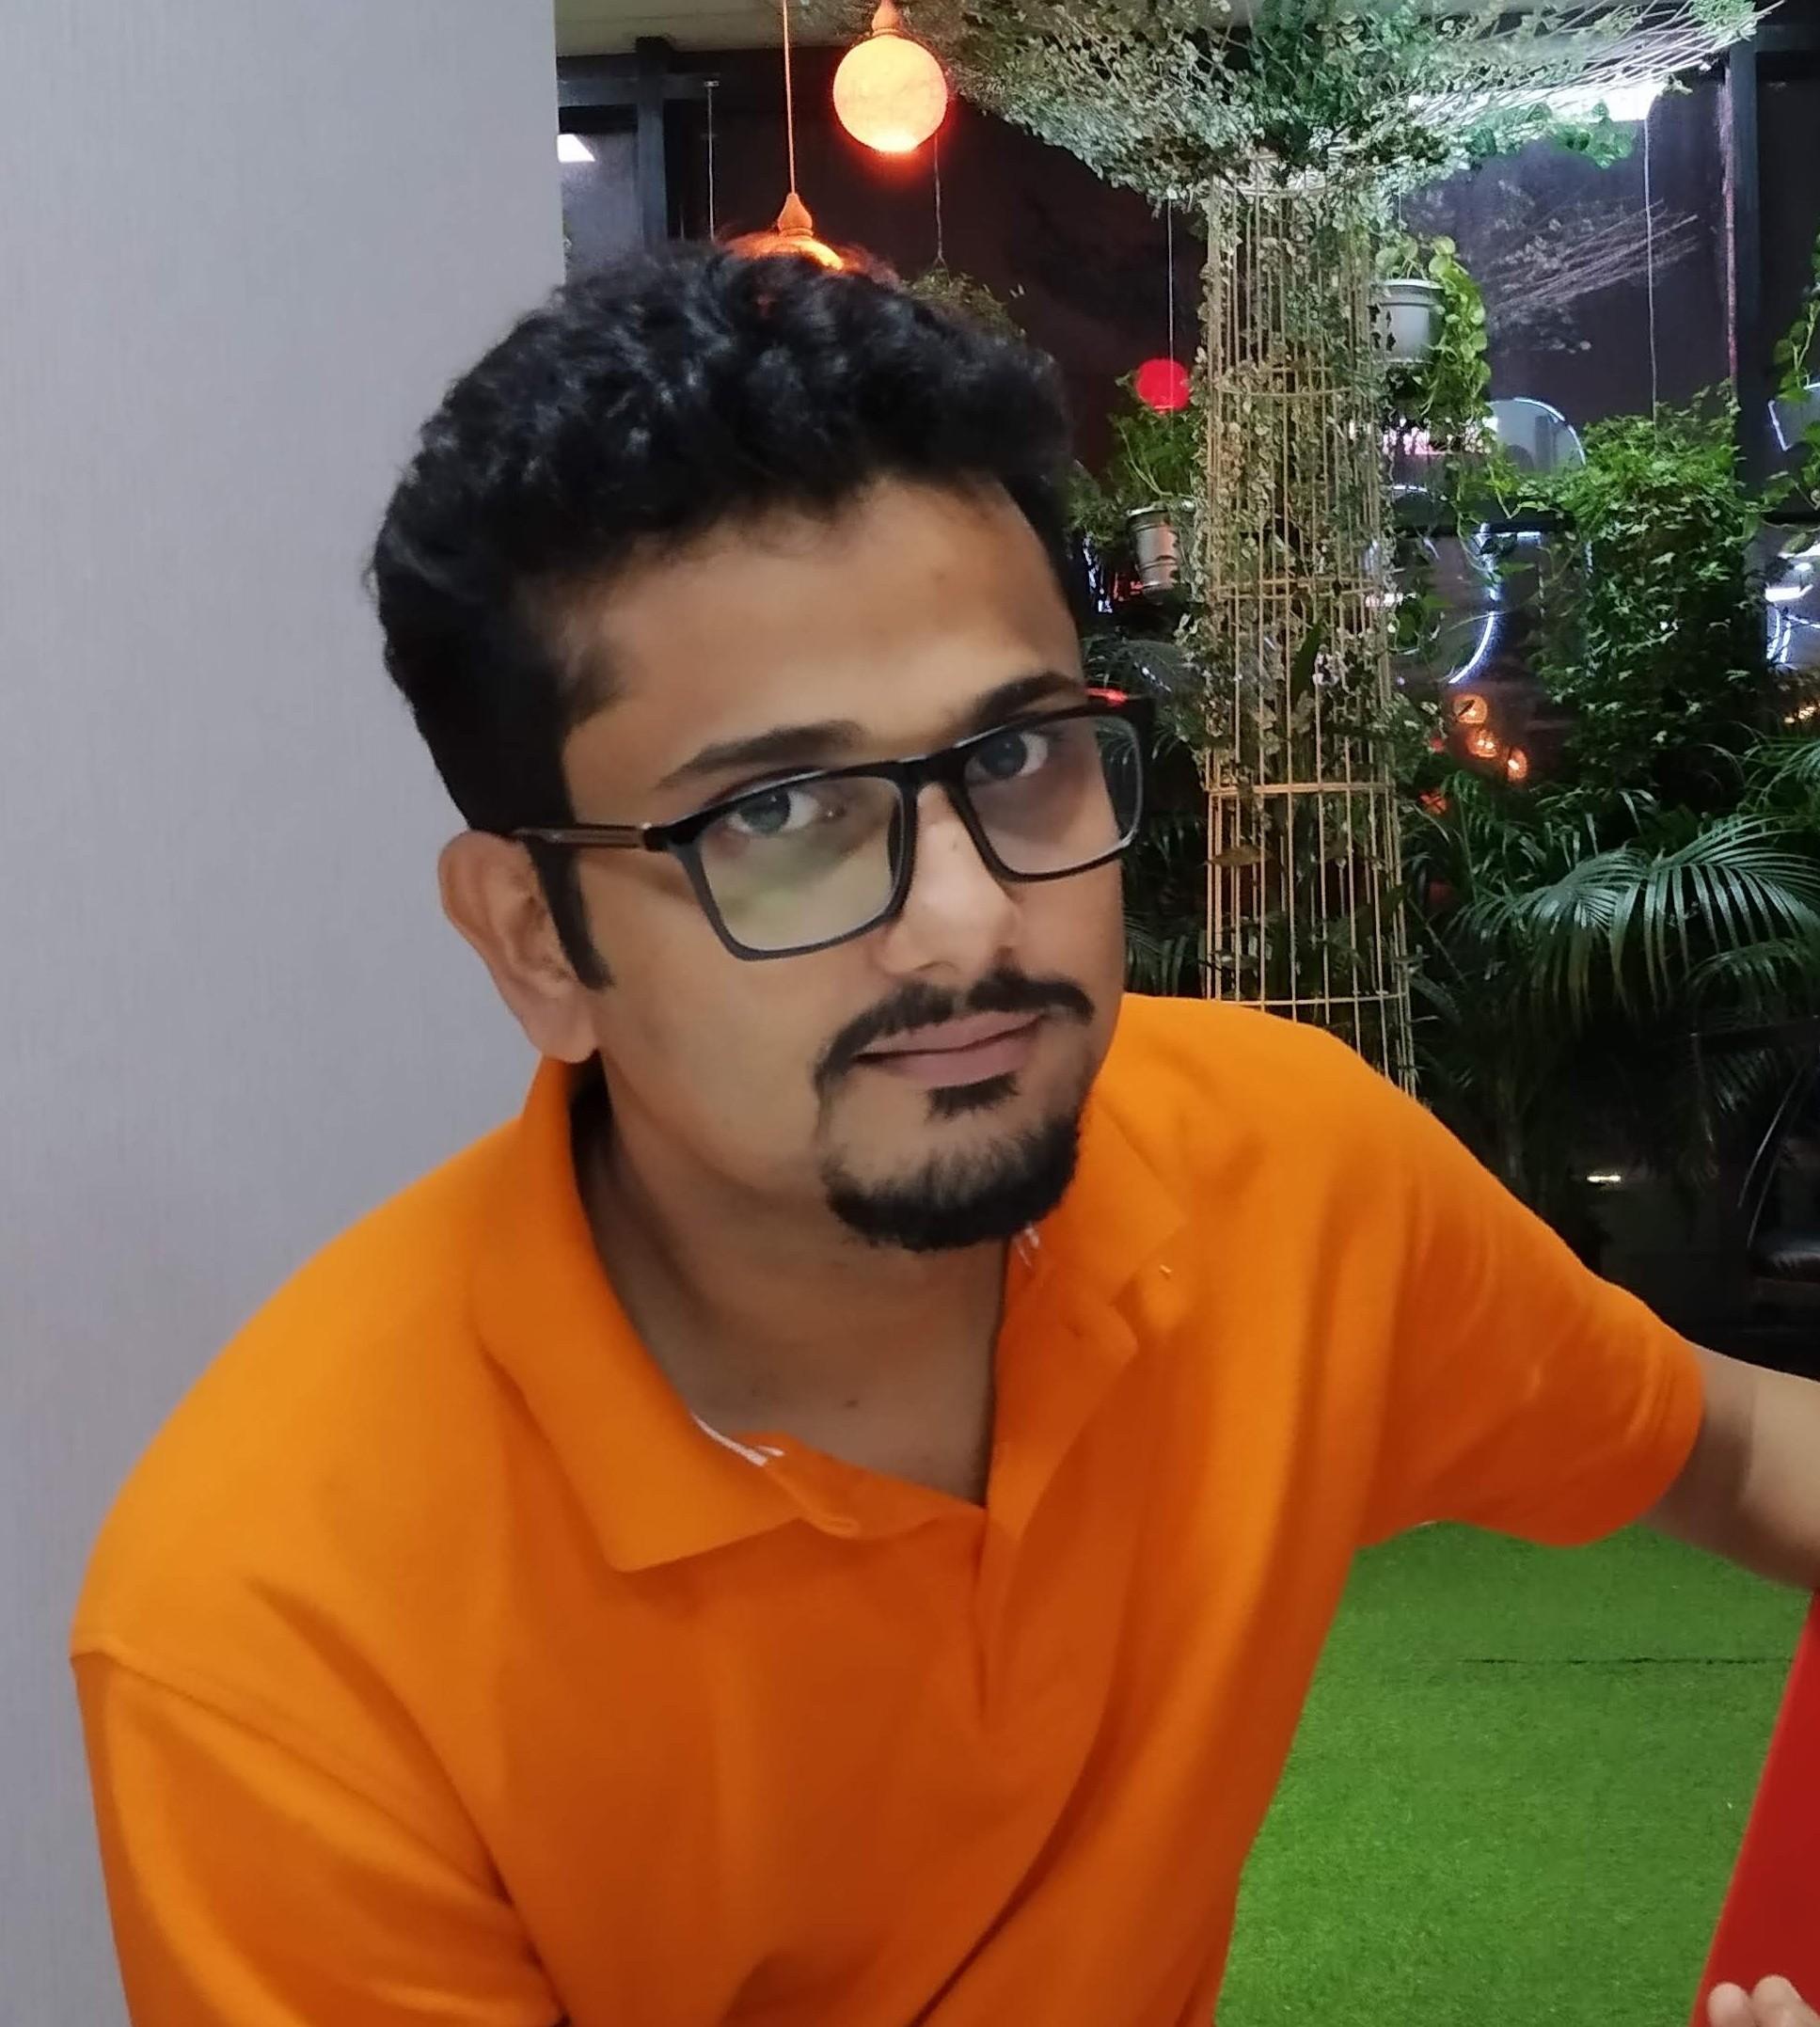 Mostaq Mahmud